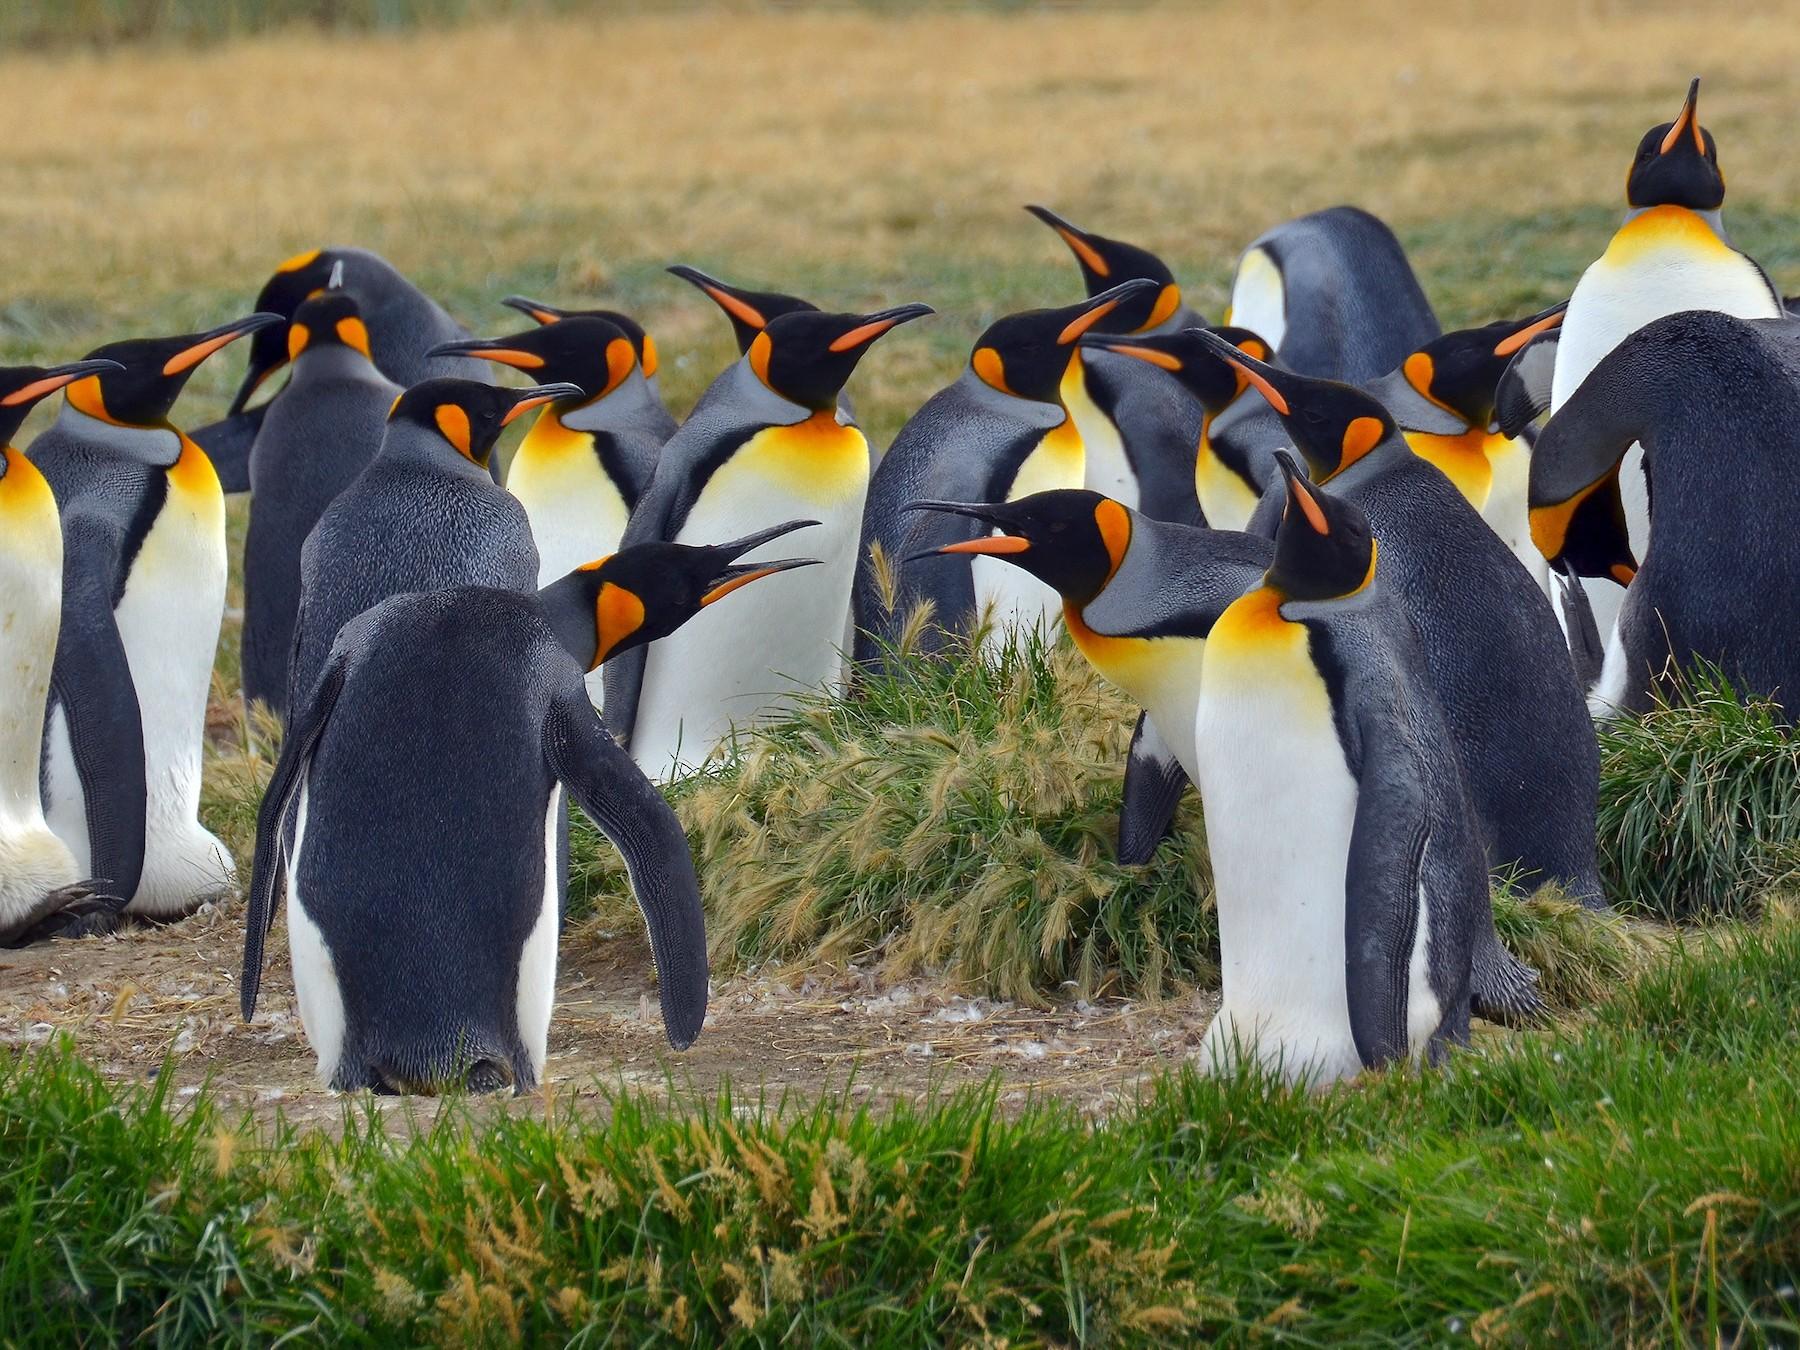 King Penguin - Pablo Gutiérrez Maier